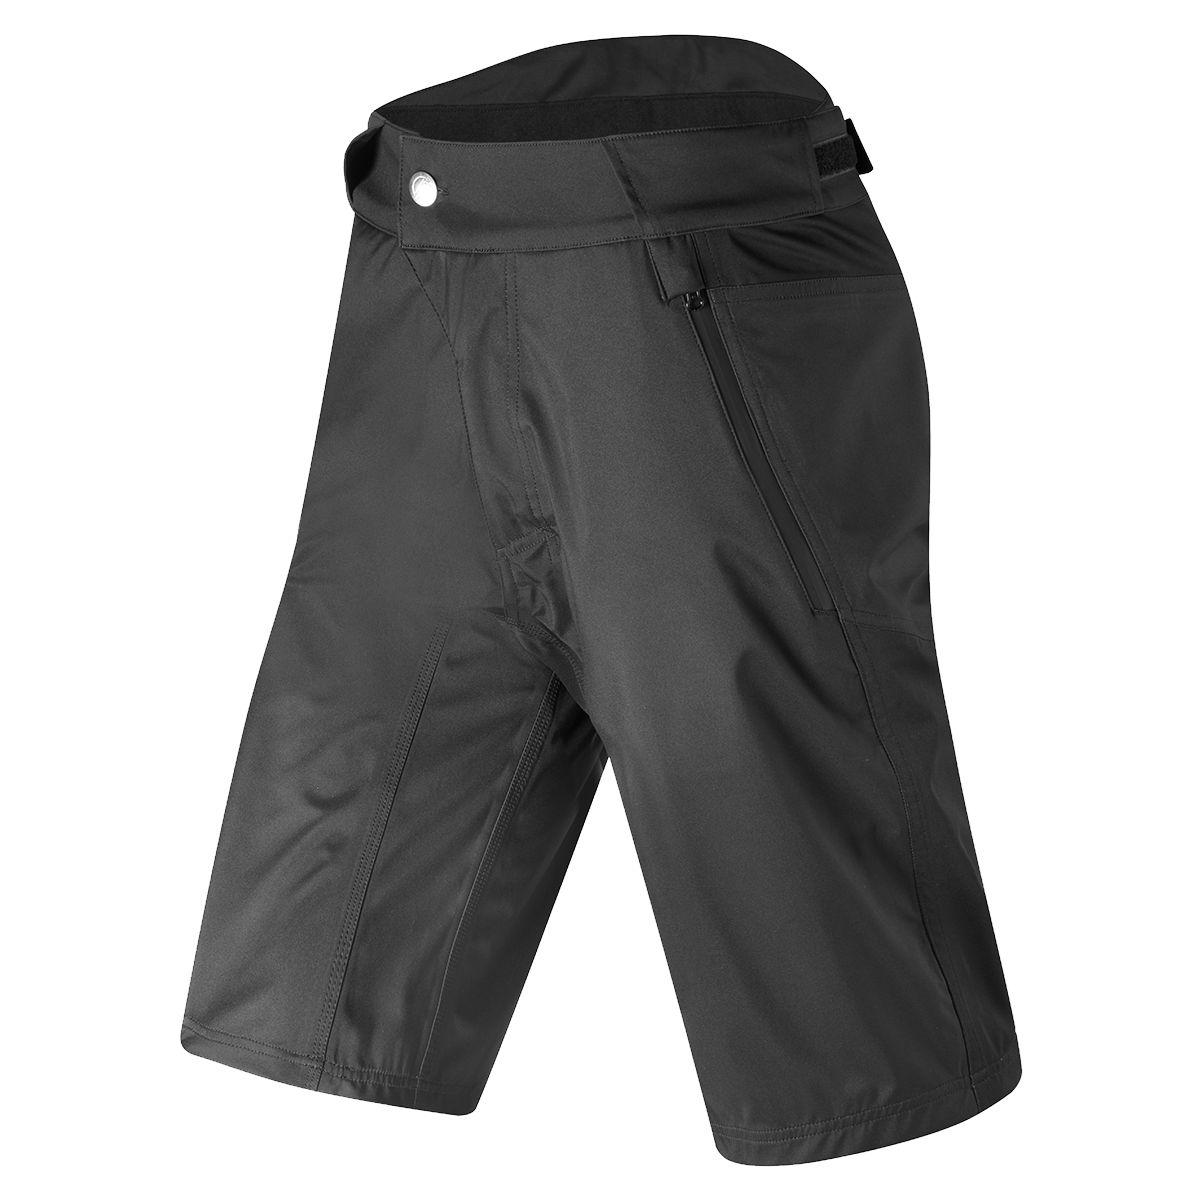 Altura - All Roads Waterproof | bike pants